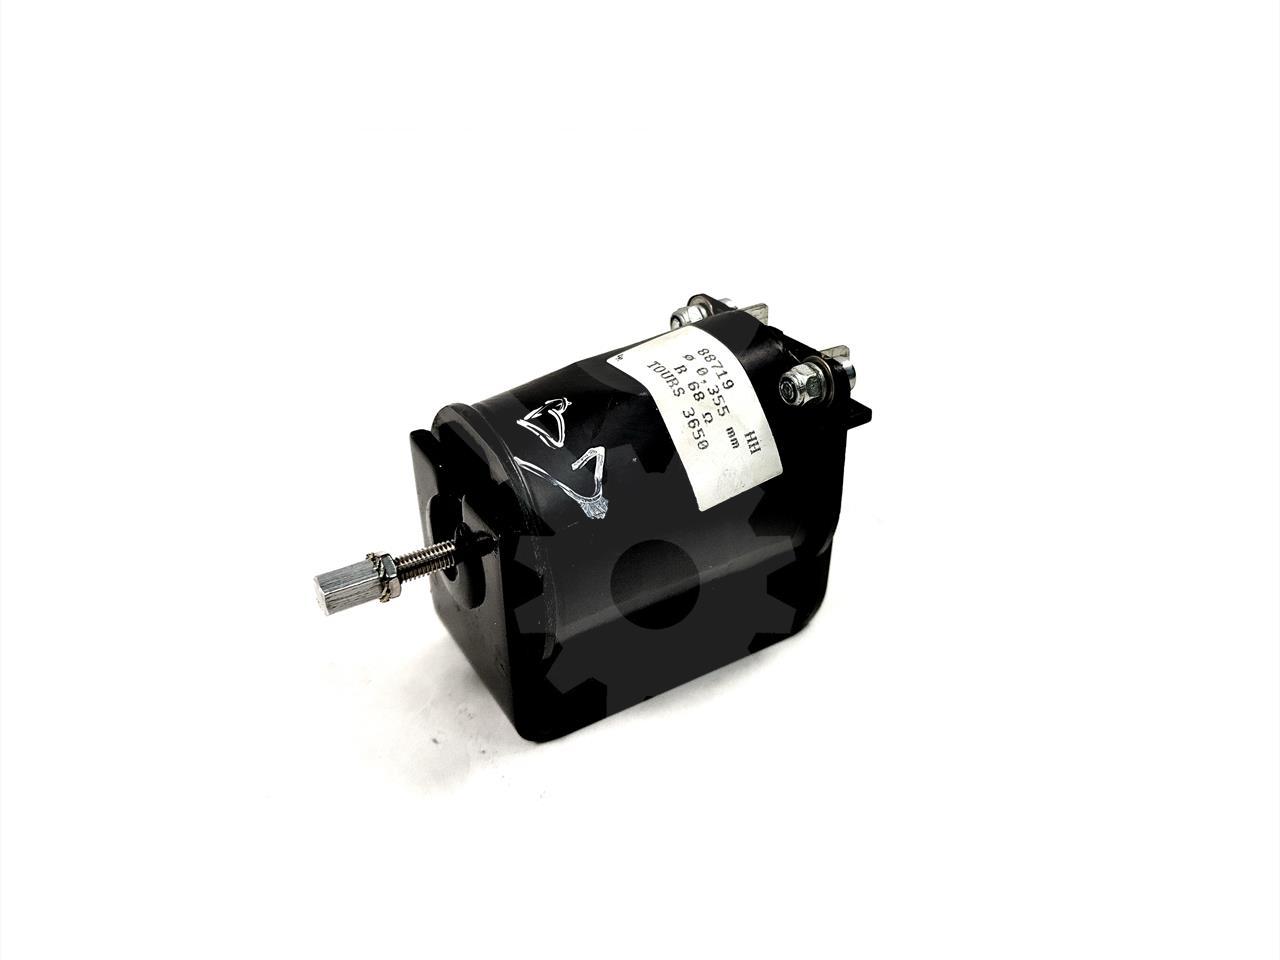 46040-479-51 Square D 125VDC CLOSE COIL ASSEMBLY FOR VR VAD-5, 18KA